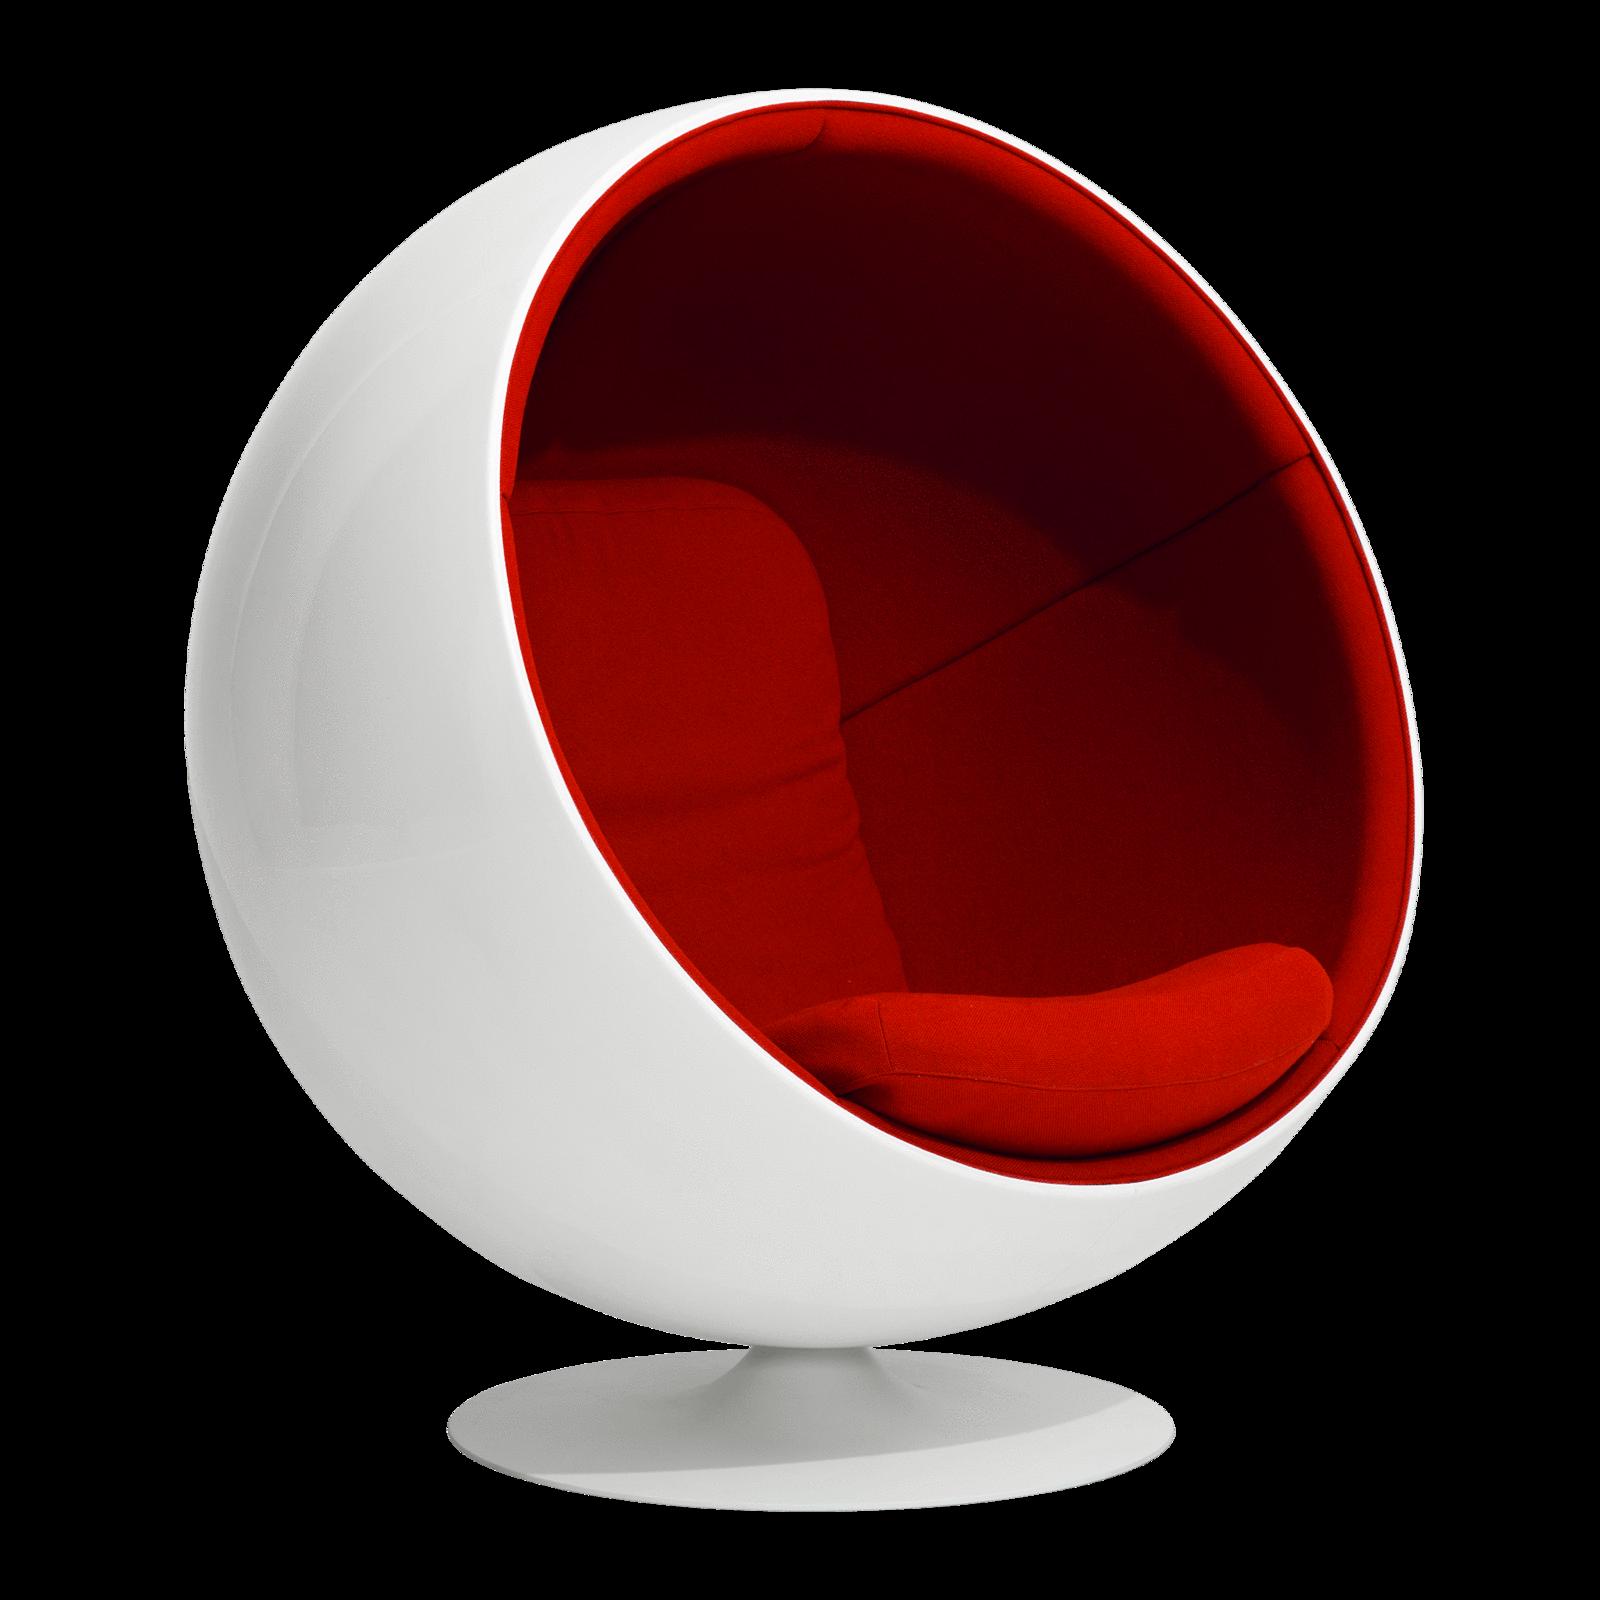 eero-ballchair-tonus-aarnio-ball-bubble-acrylic-lucite-standing-chair.png